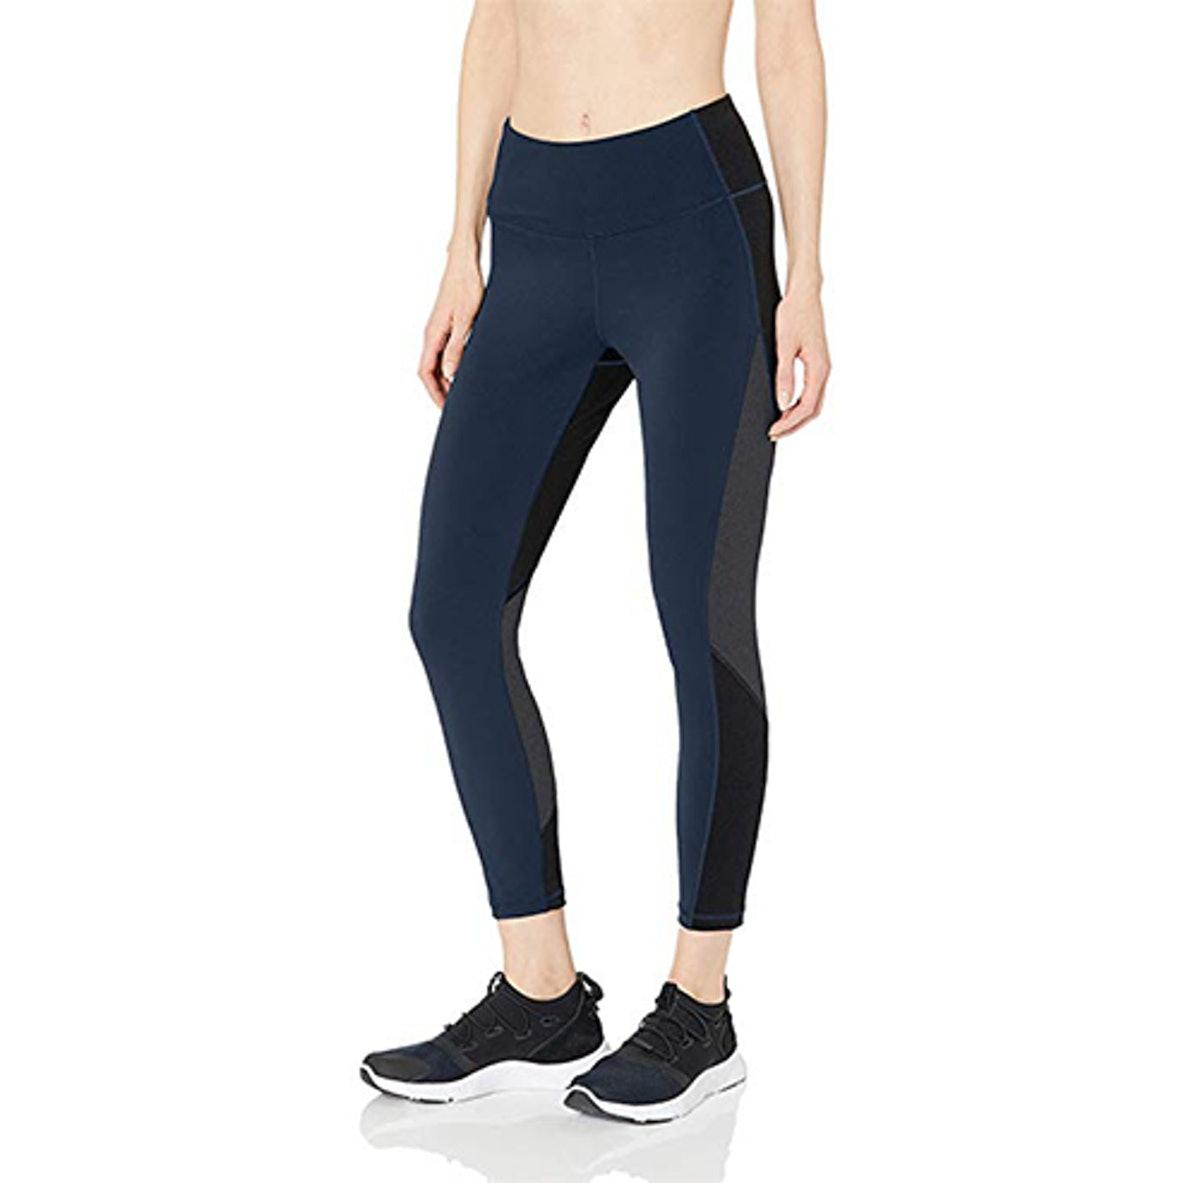 Amazon Essentials Women's Performance Leggings